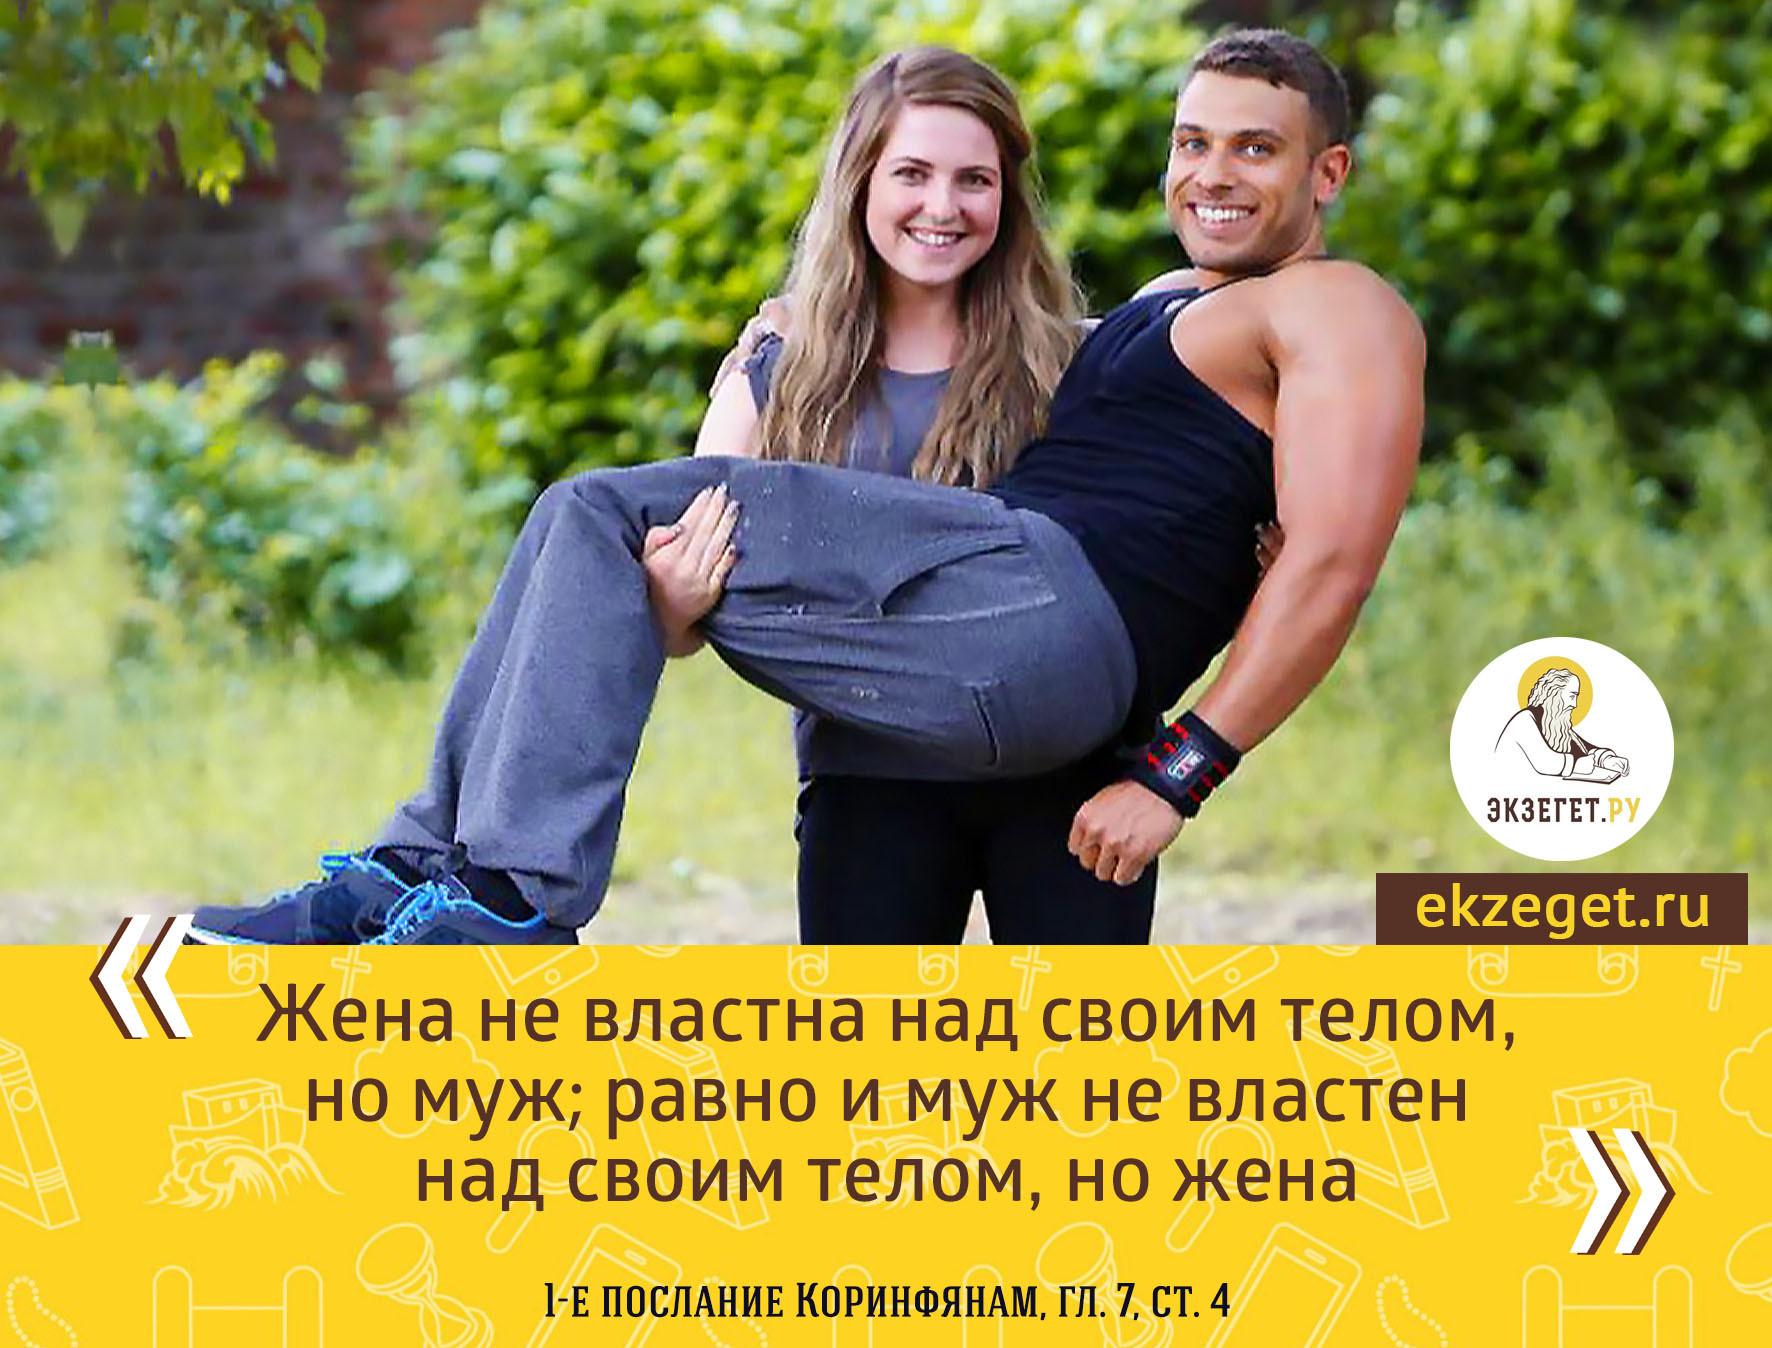 1 Кор. 7:4 Жена не властна над своим телом, но муж; равно и муж не властен над своим телом, но жена.